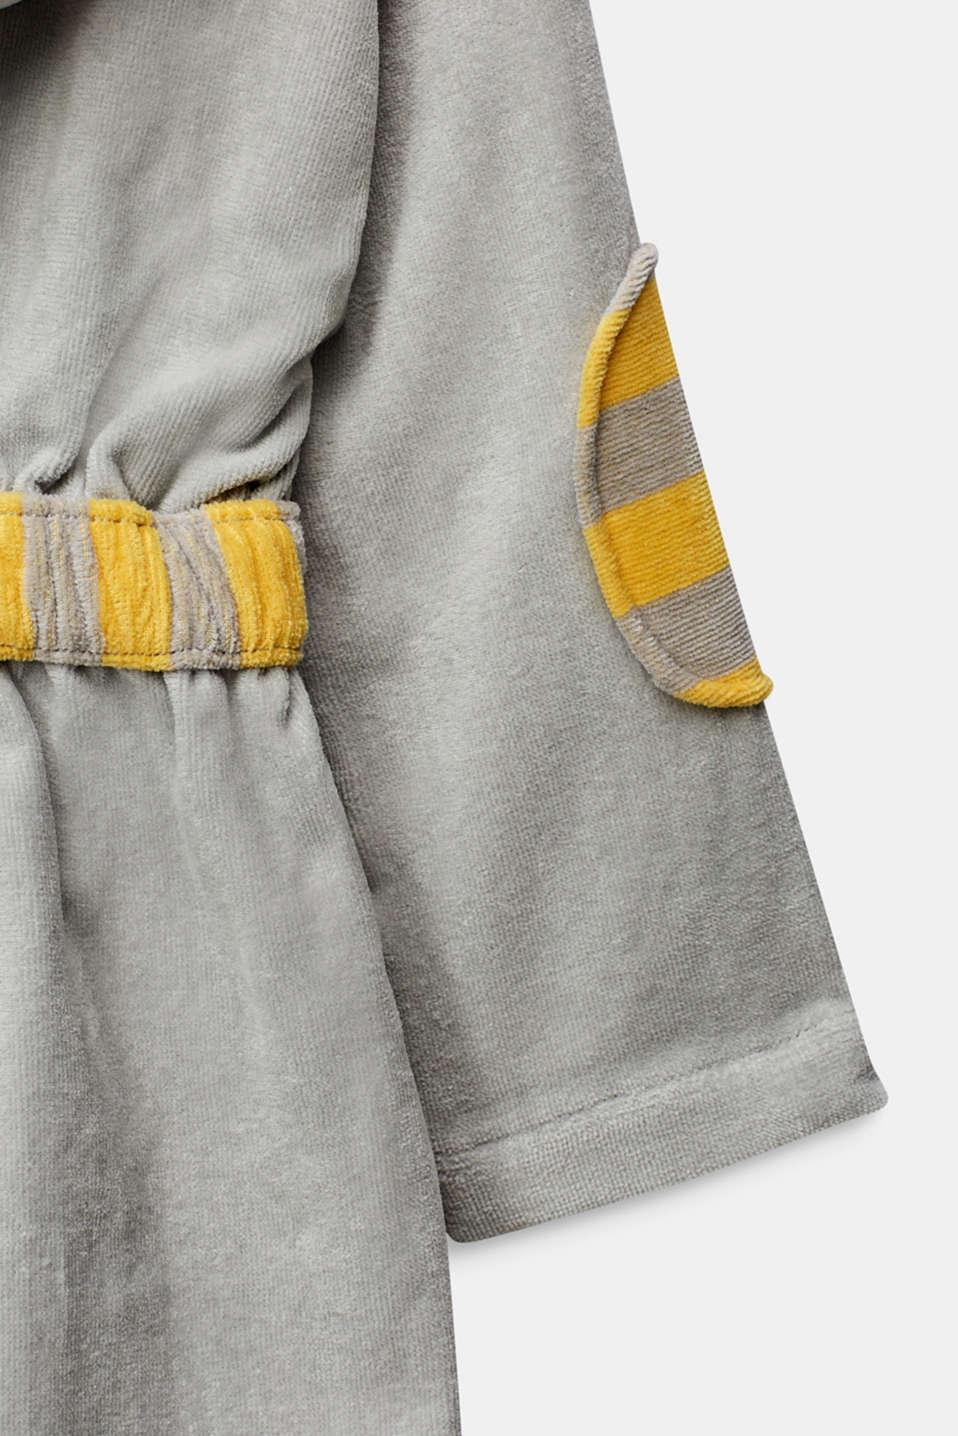 Children's bathrobe in 100% cotton, STONE, detail image number 3